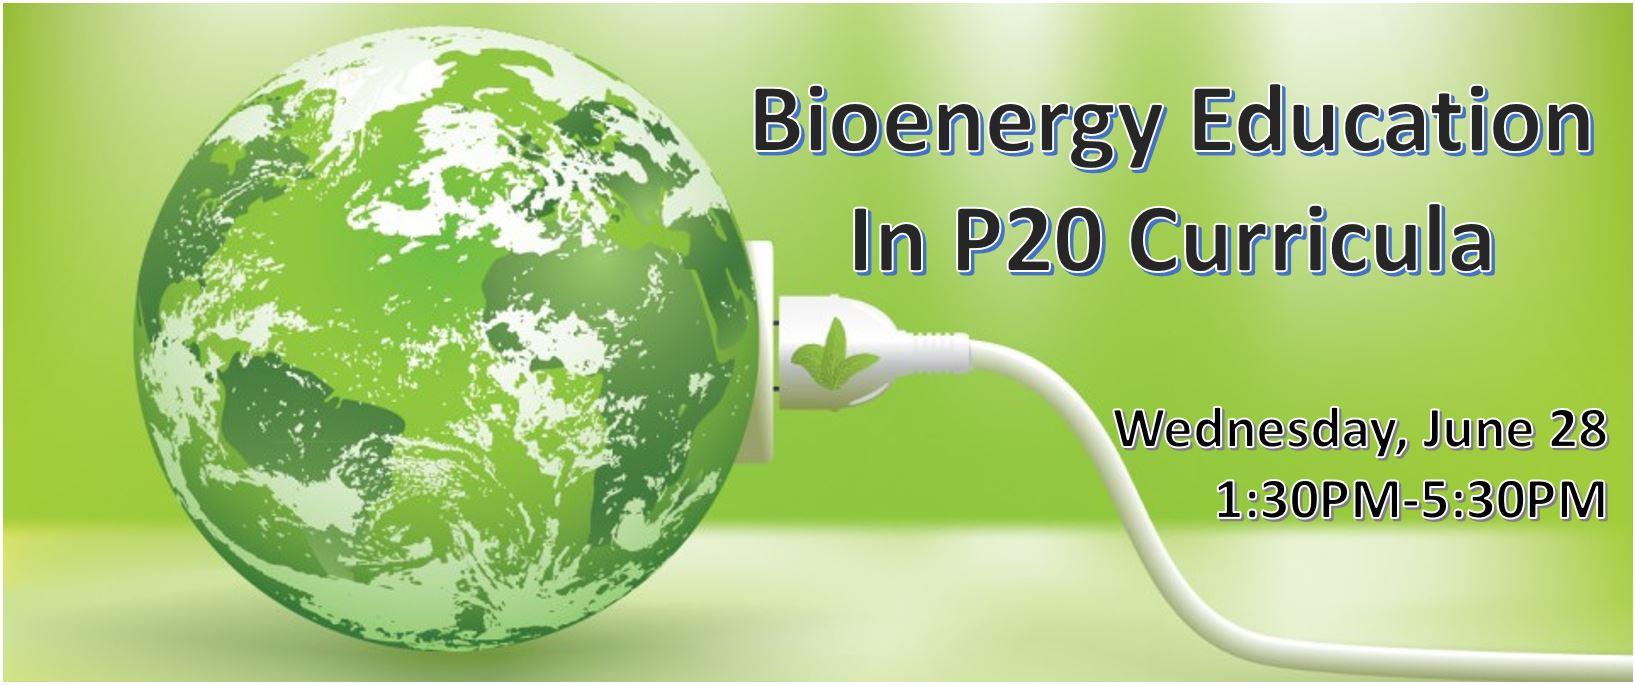 Bioenergy Education in P20 Curricula